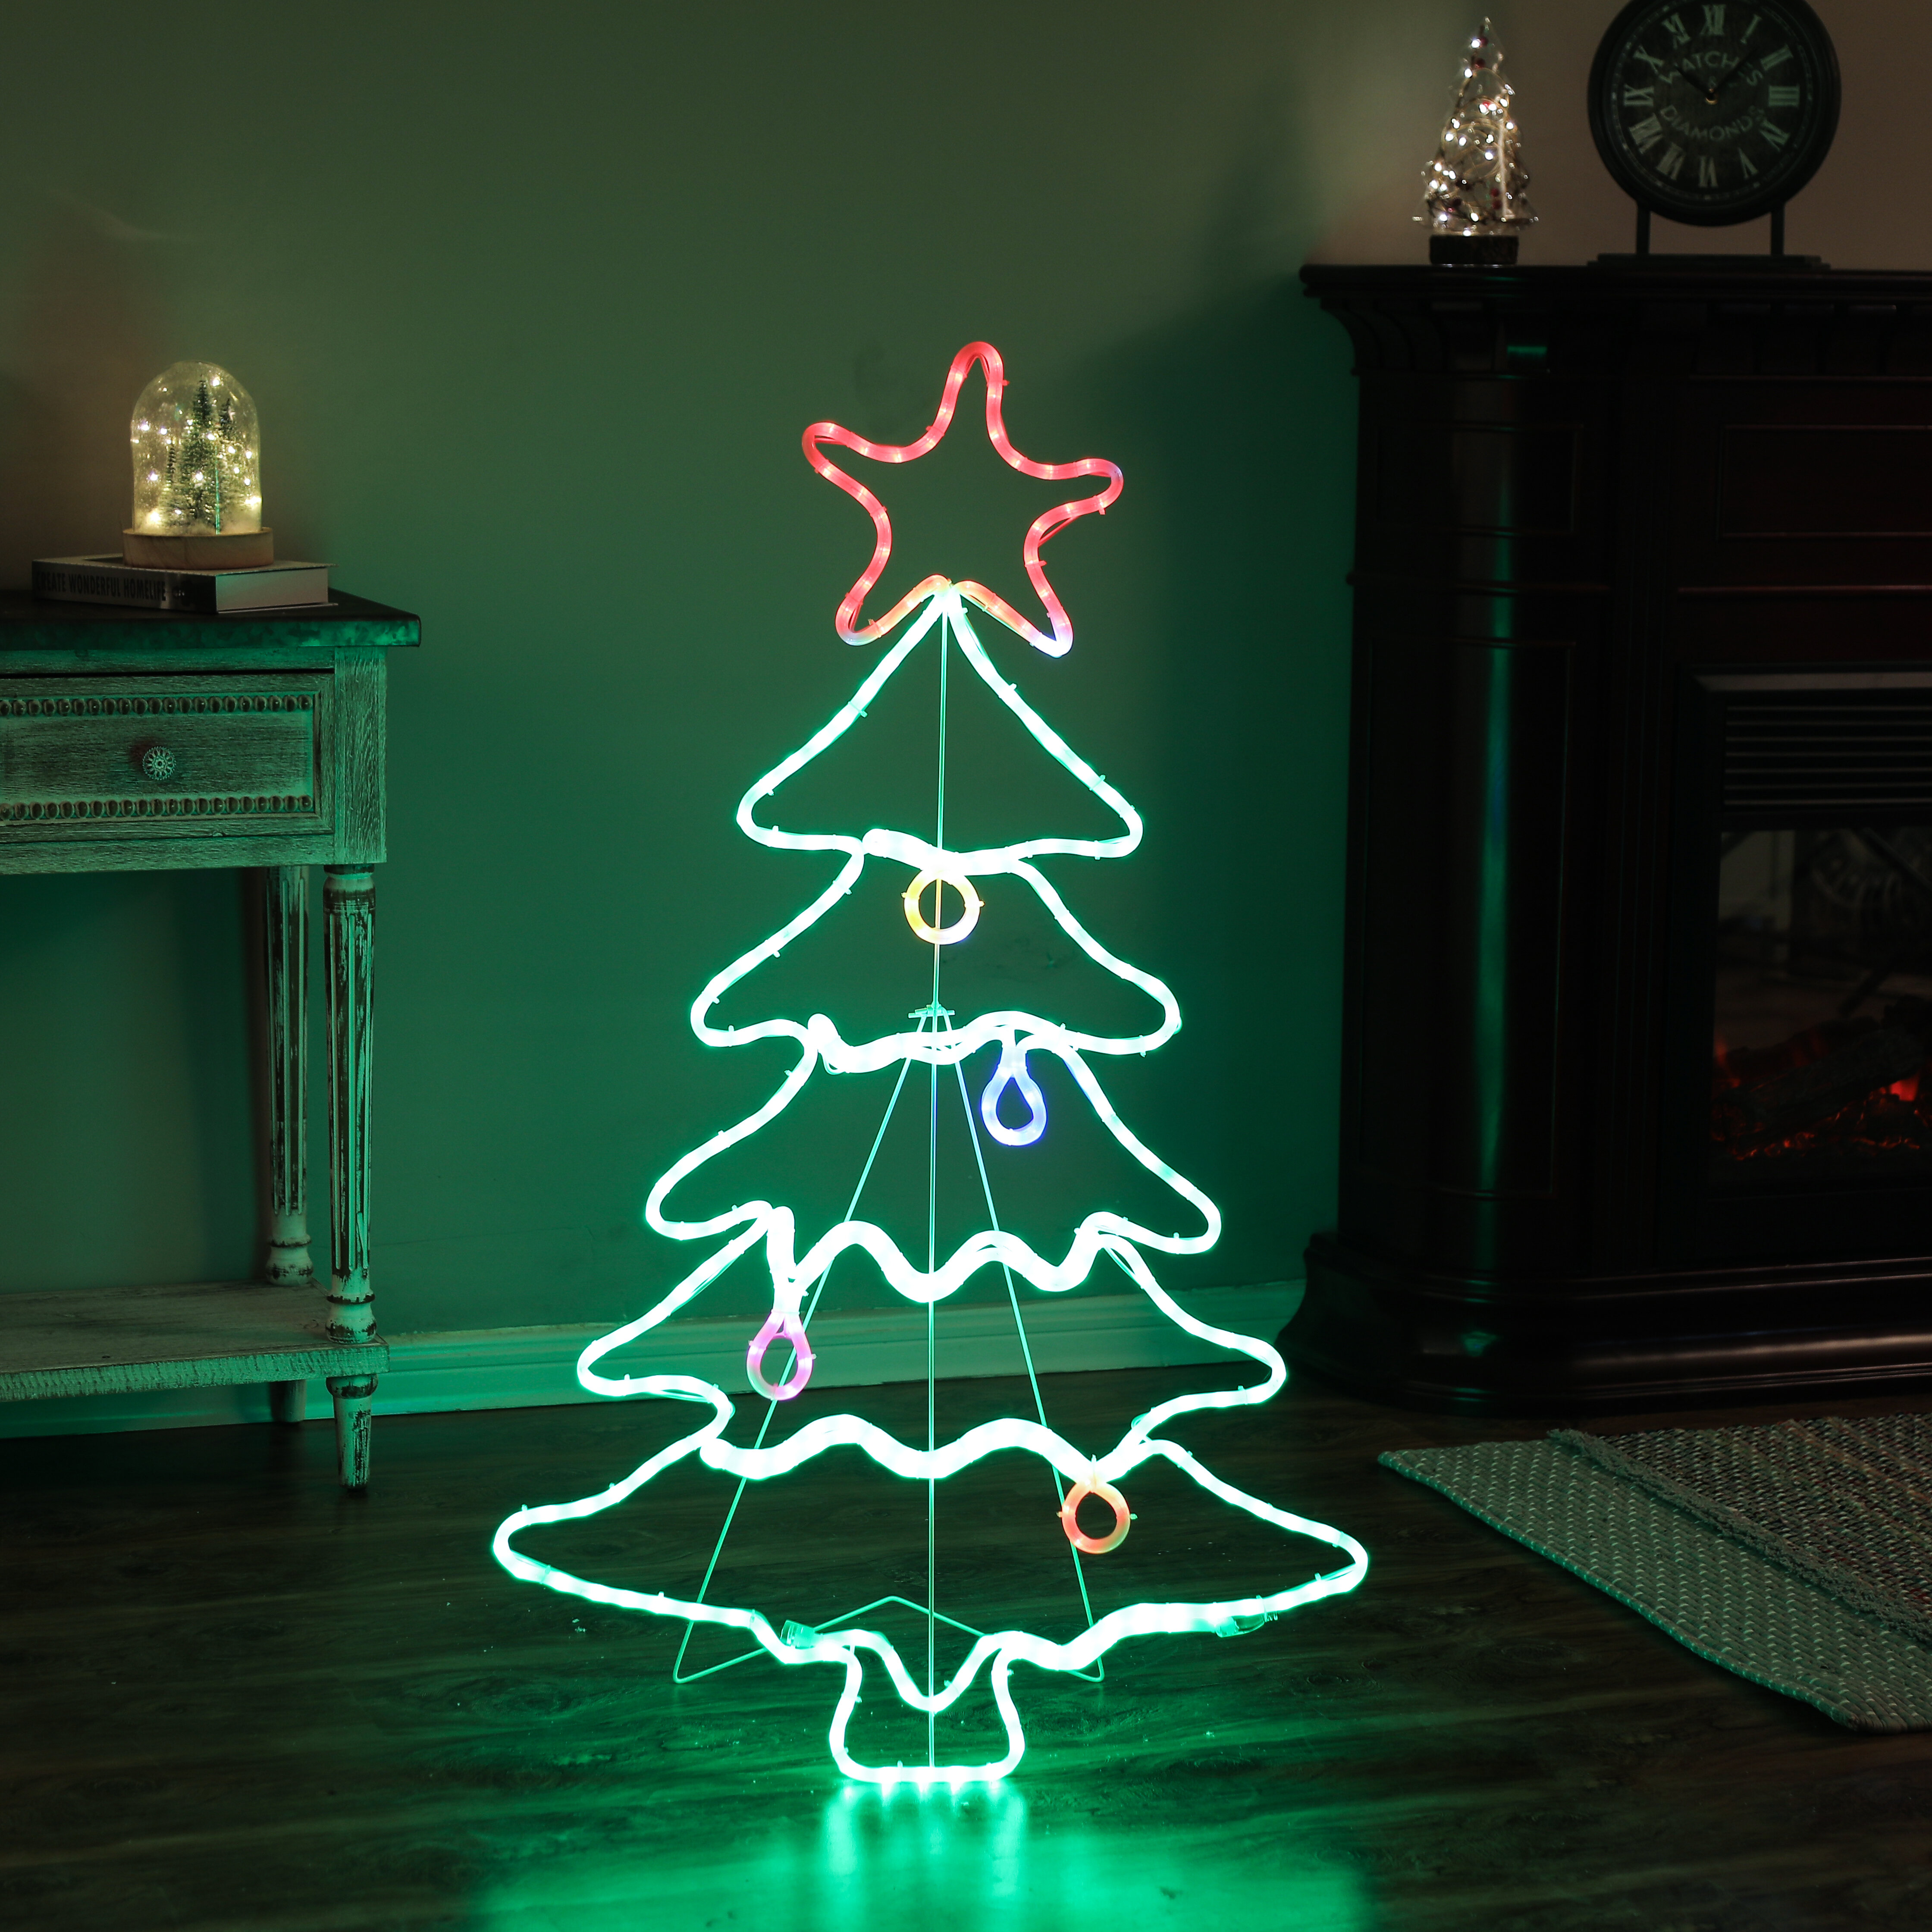 Tree Indoor Outdoor Christmas Lighted Display